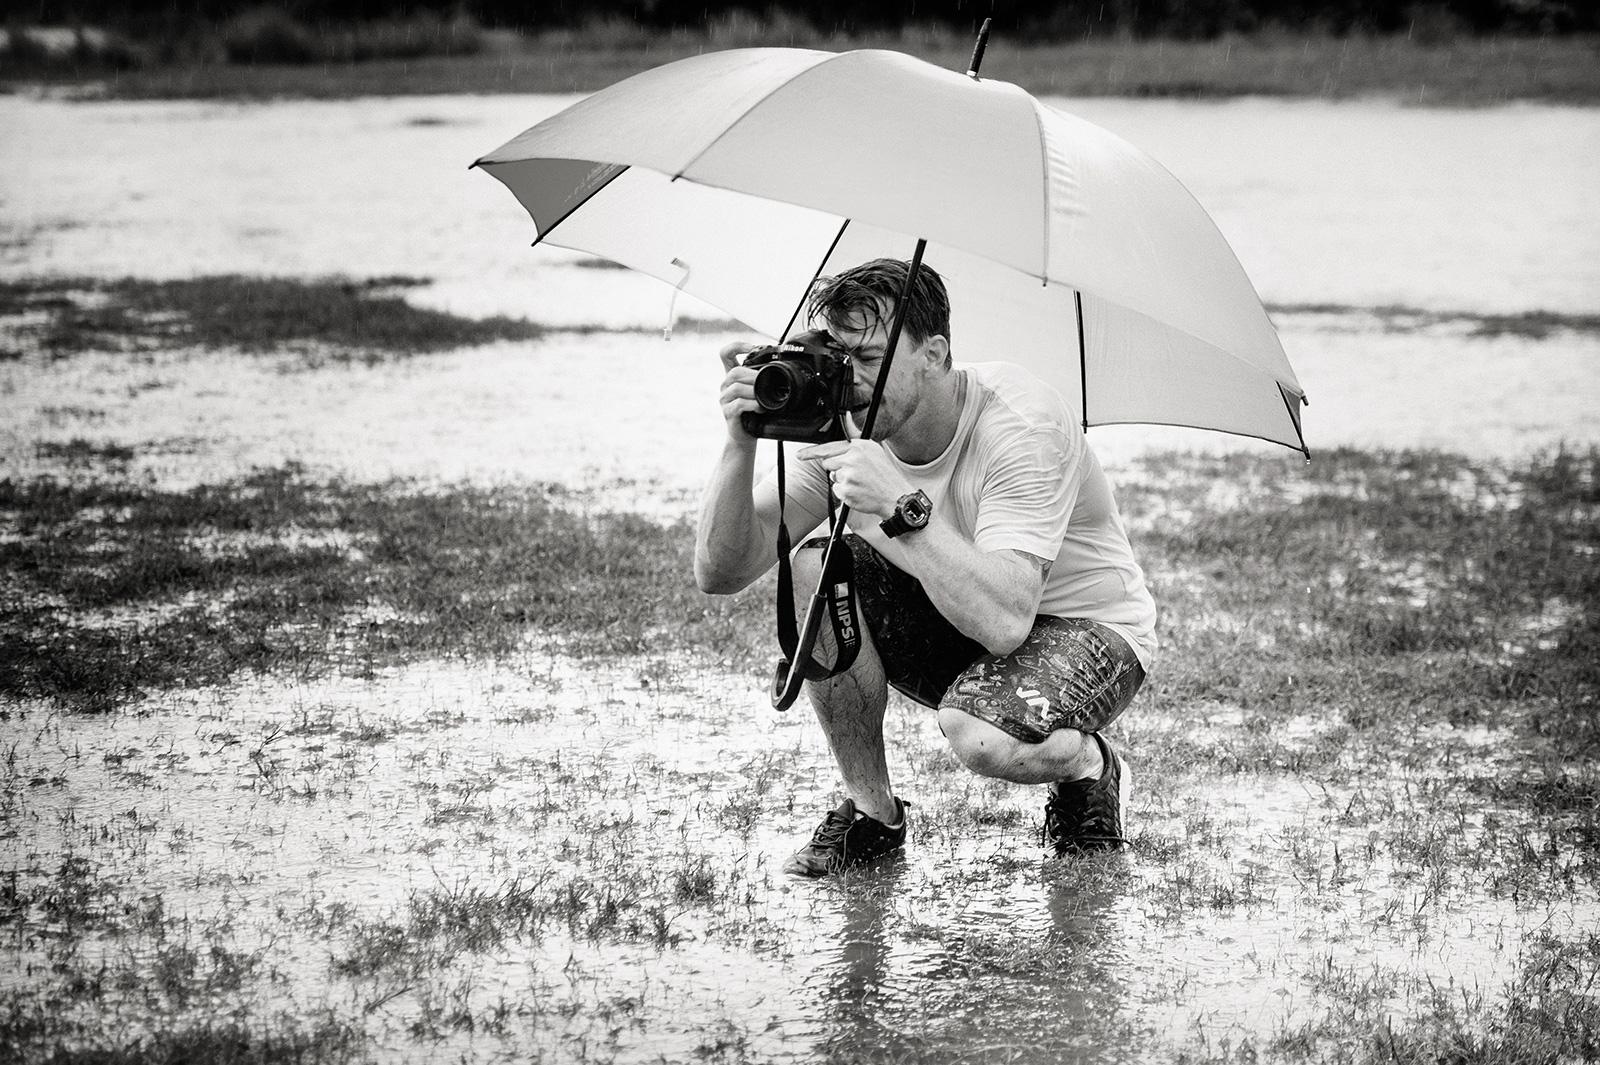 Photographer on location in rain